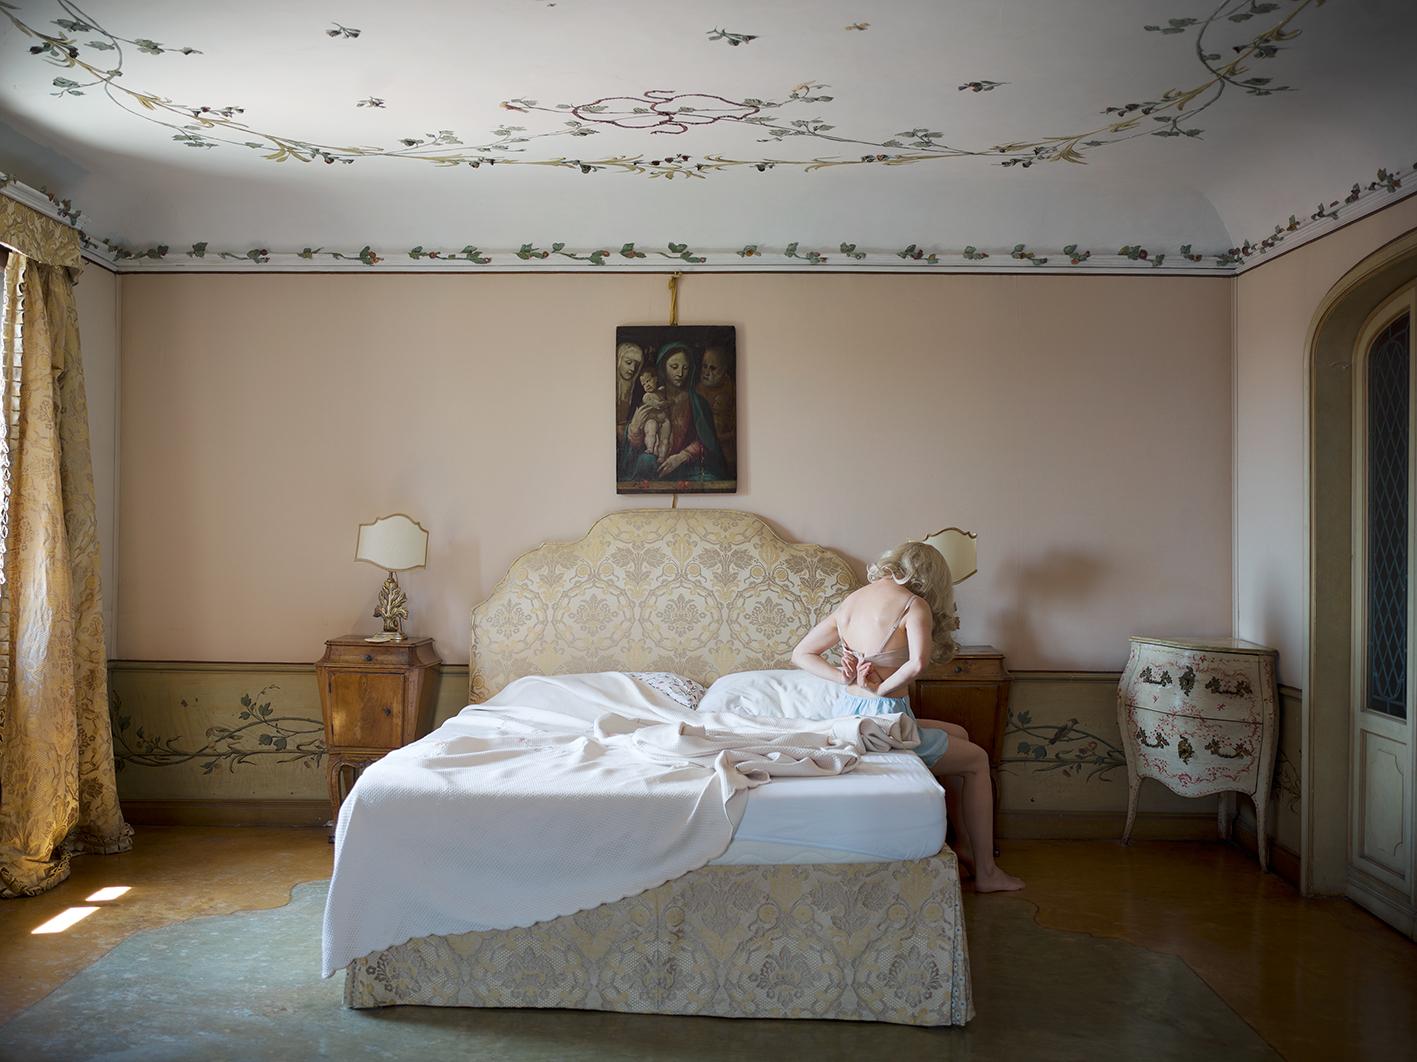 The Girl Of Constant Sorrow © Anja Niemi _ The Little Black Gallery.jpg